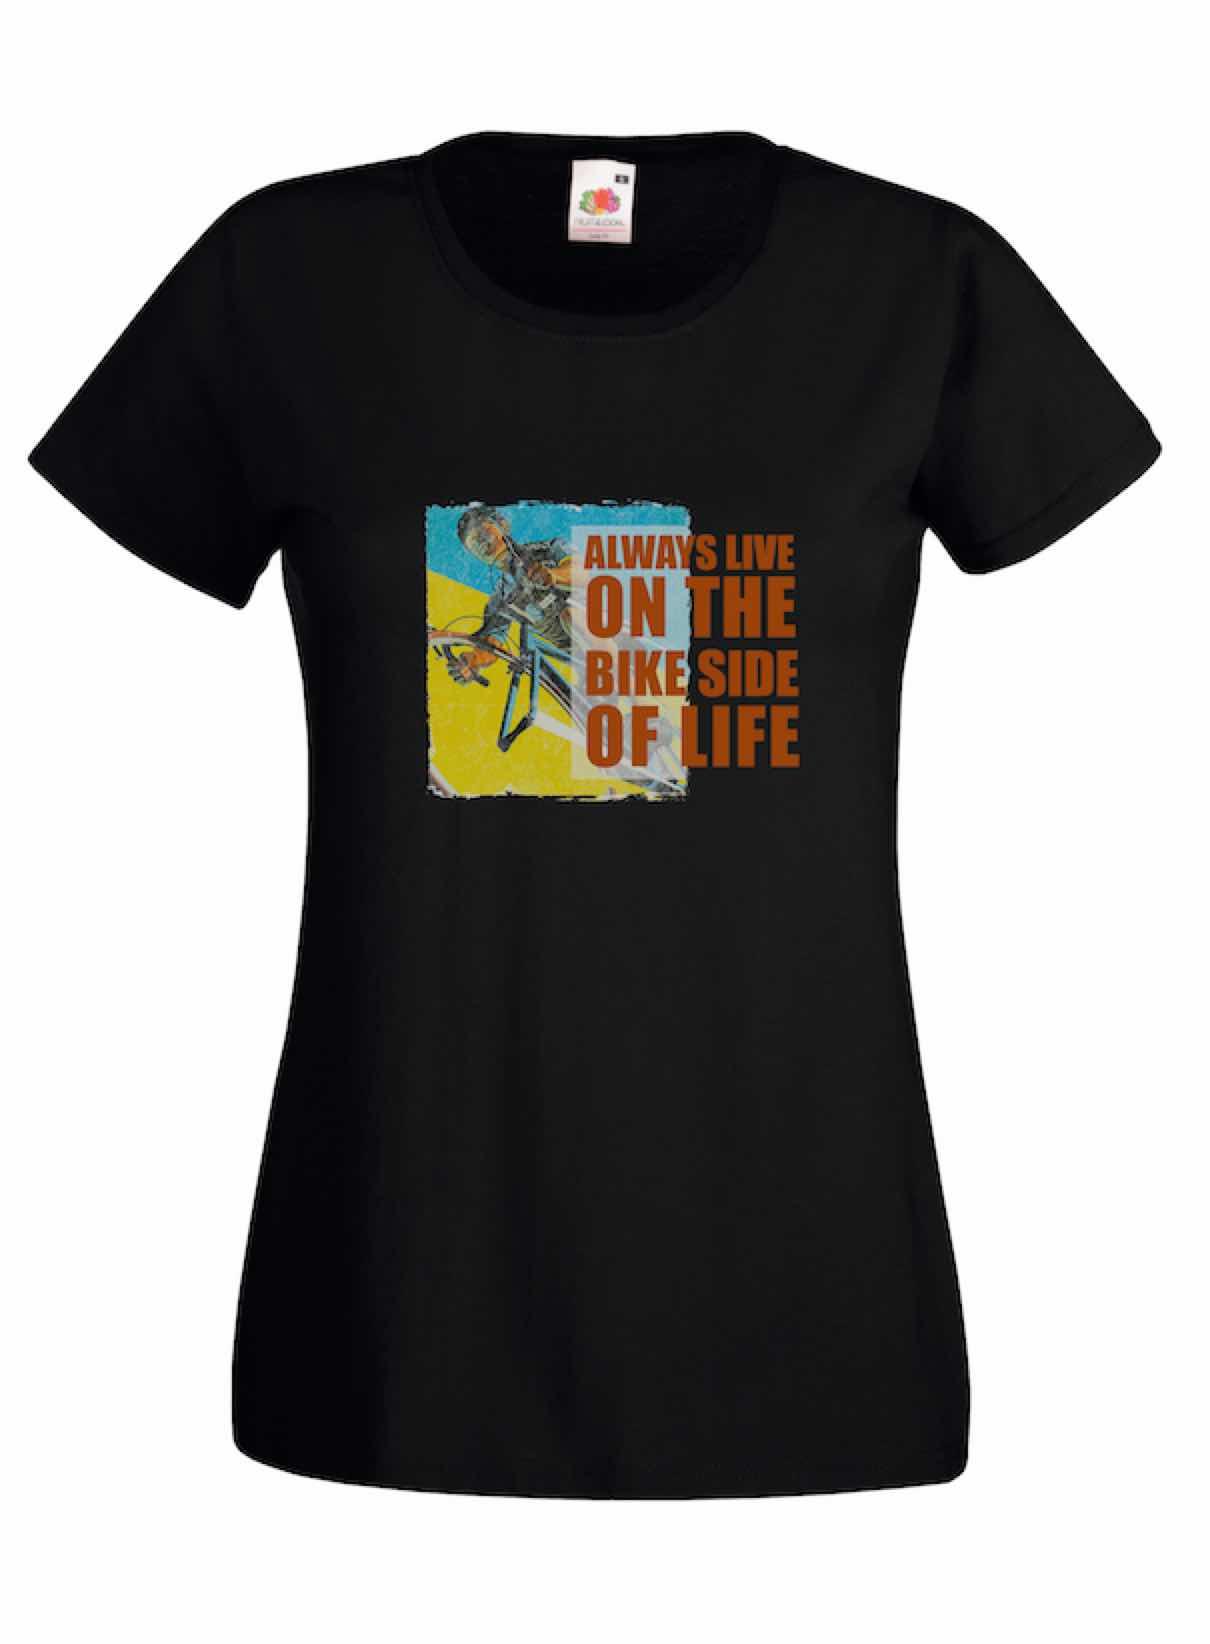 Bike Side design for t-shirt, hoodie & sweatshirt